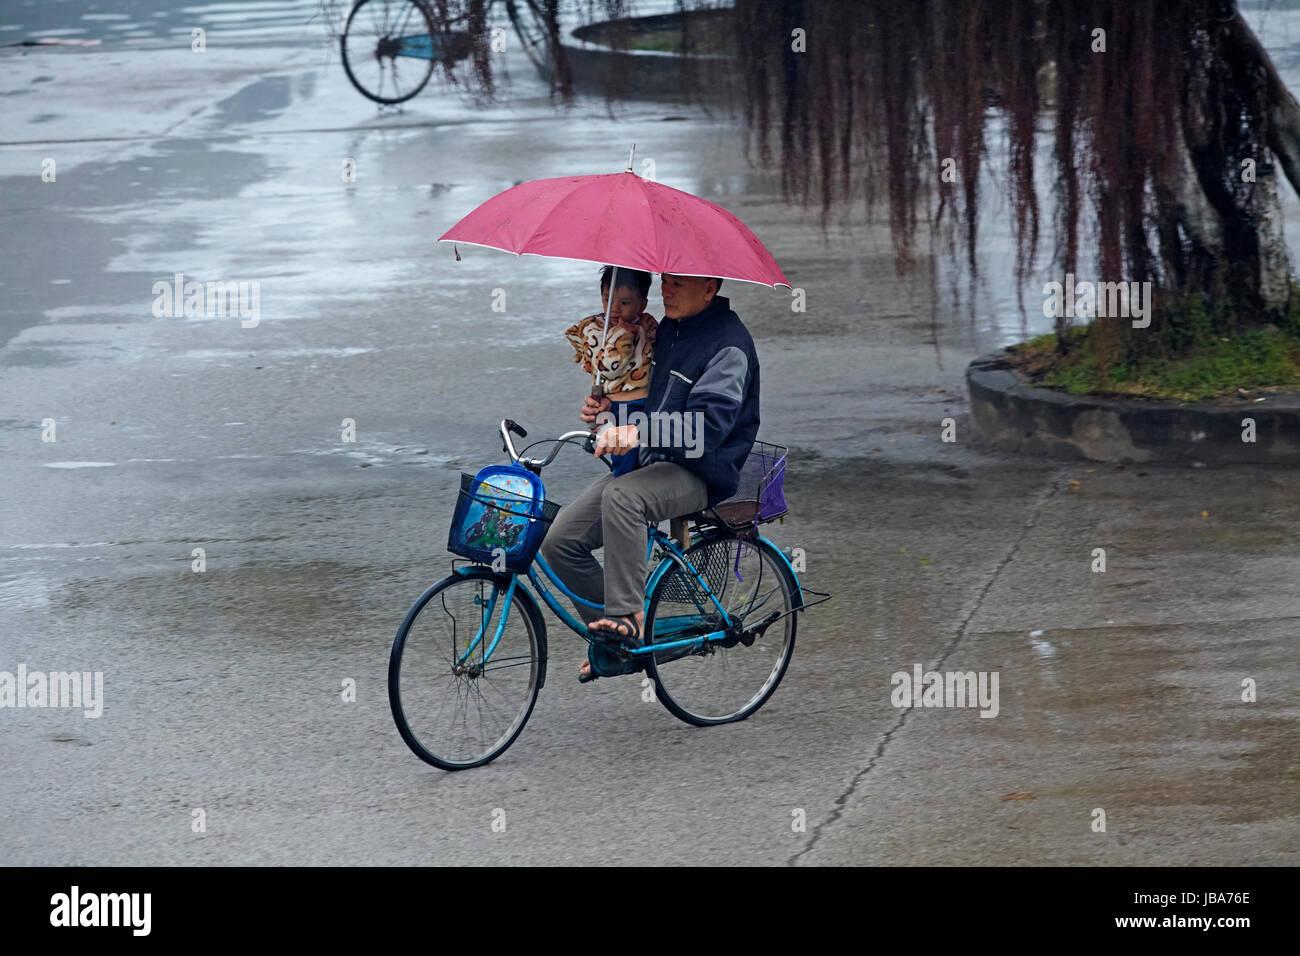 Man carrying child and umbrella, cycling in the rain, Ninh Binh, Vietnam - Stock Image